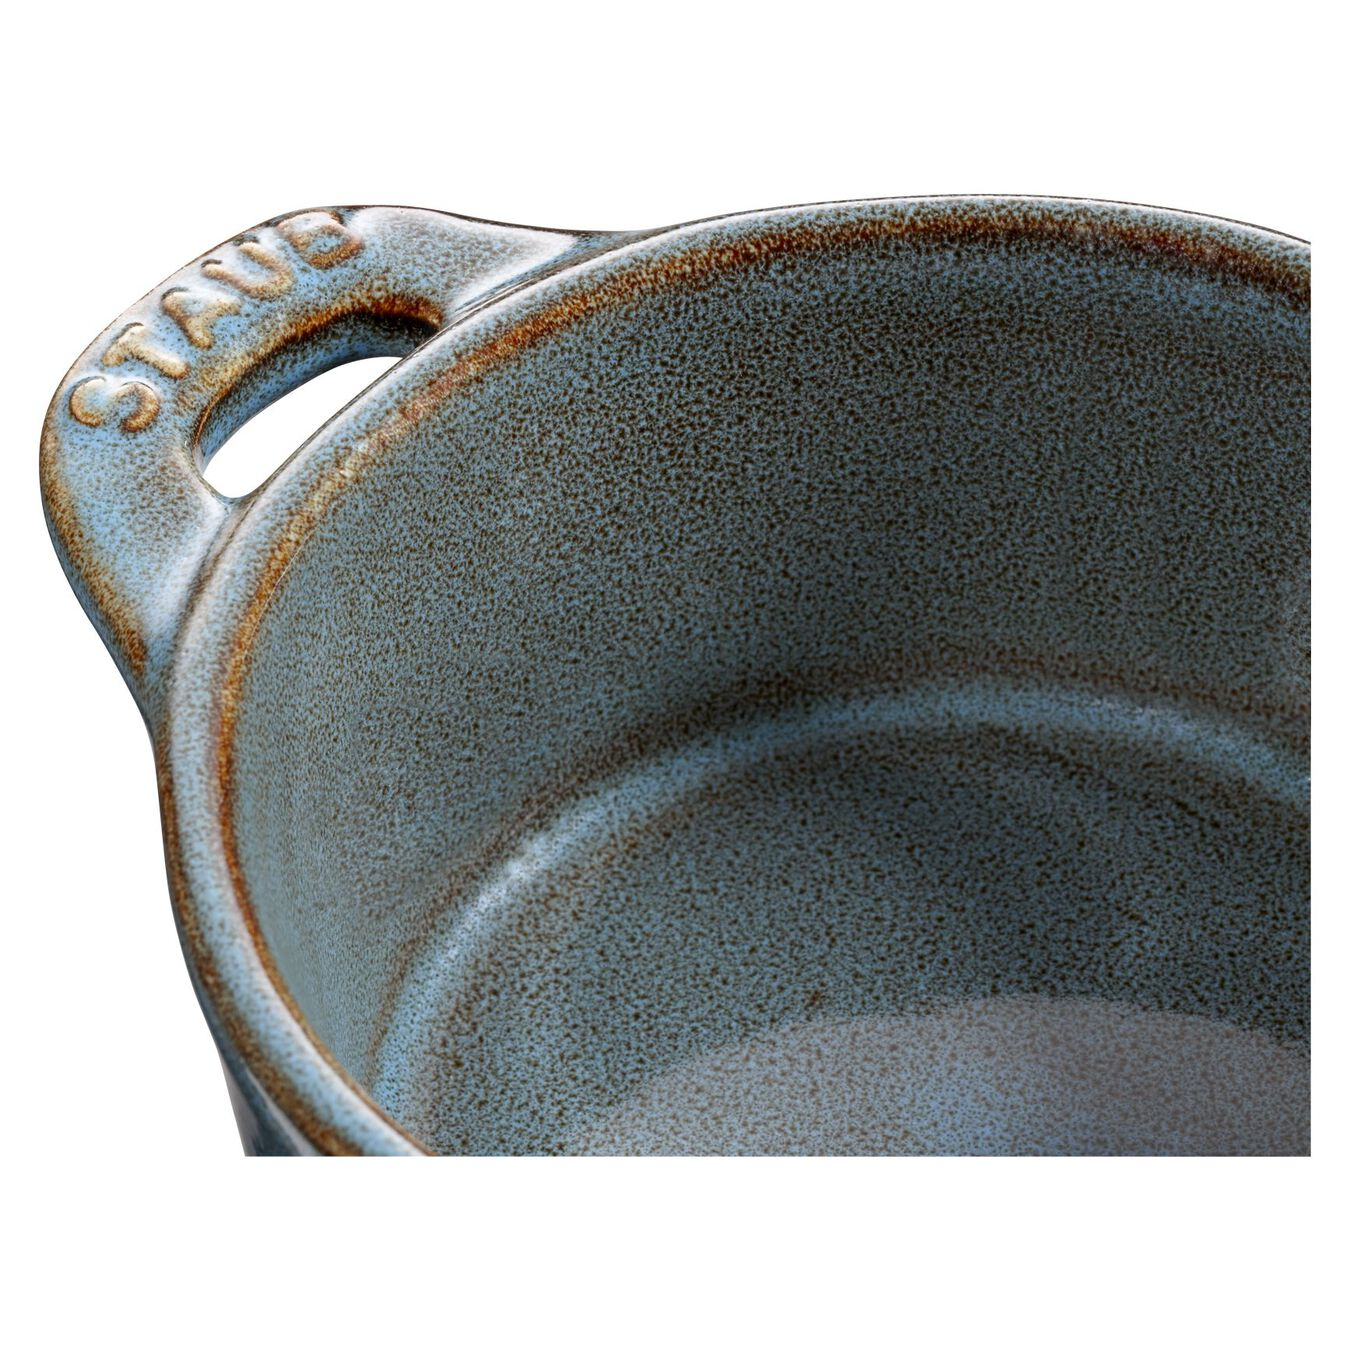 Mini cocotte rotonda - 10 cm, turchese antico,,large 5